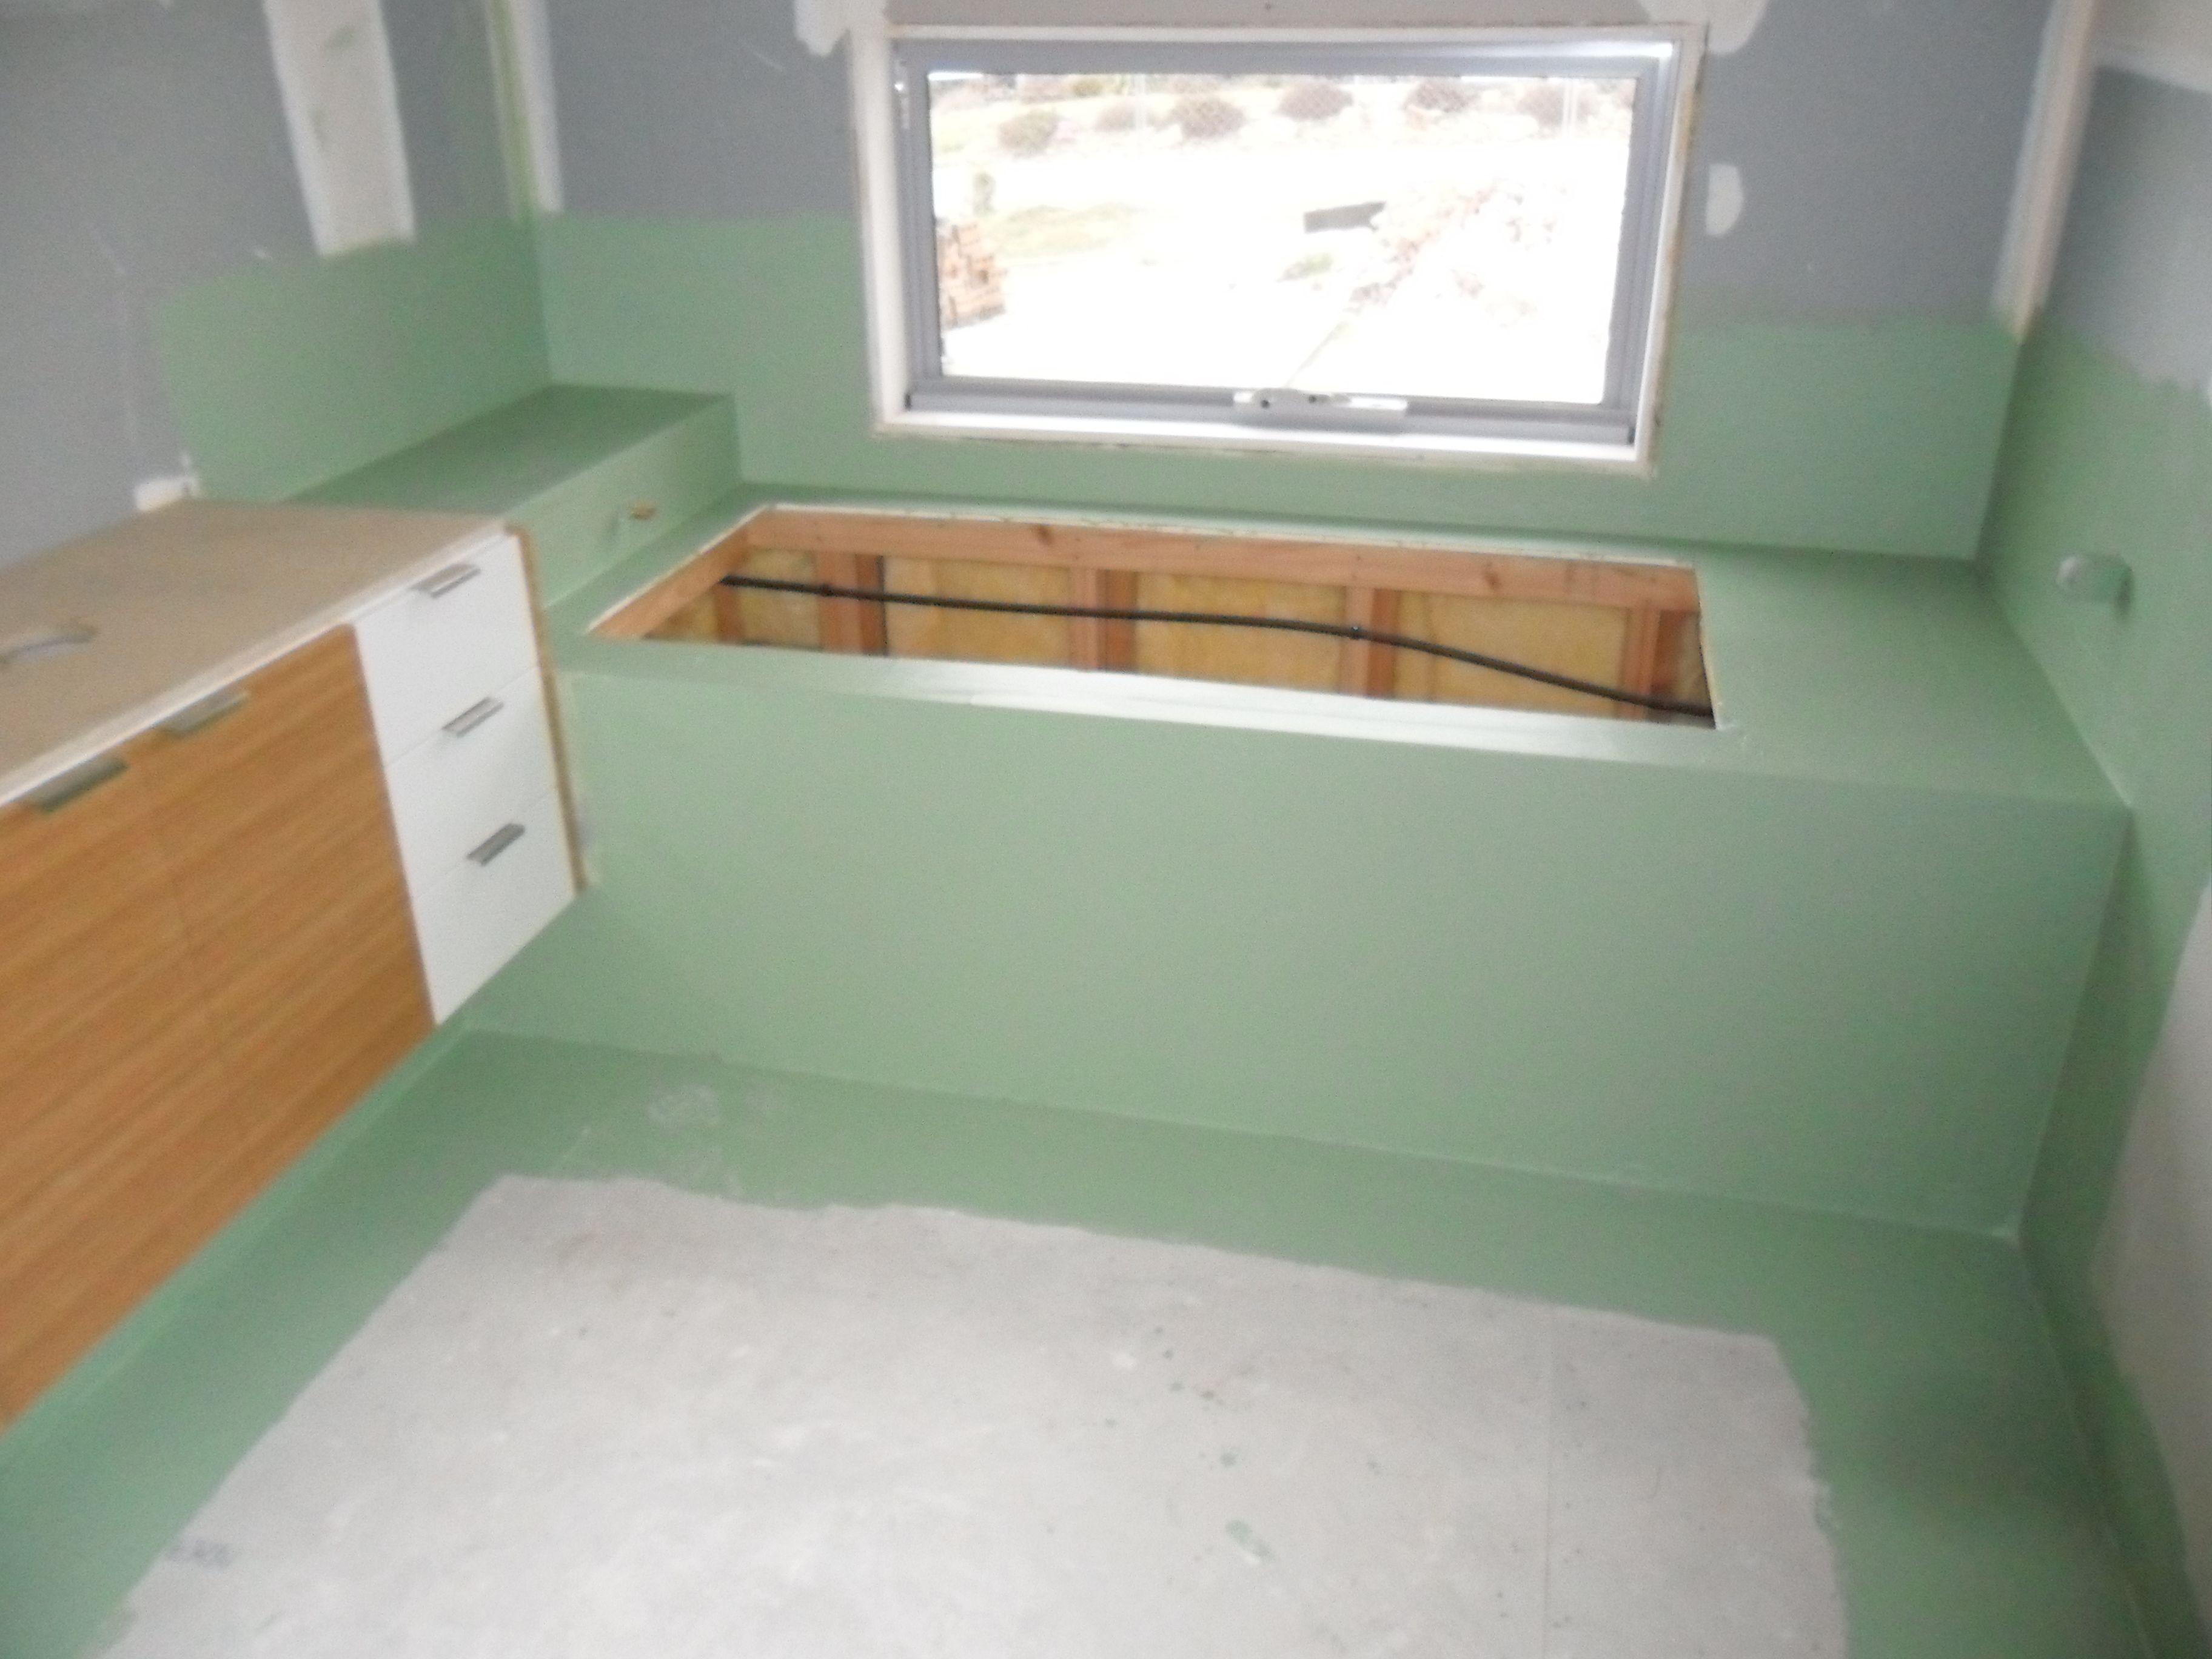 54 Park Rd. - bath hob built, insulation installed, waterproofing ...